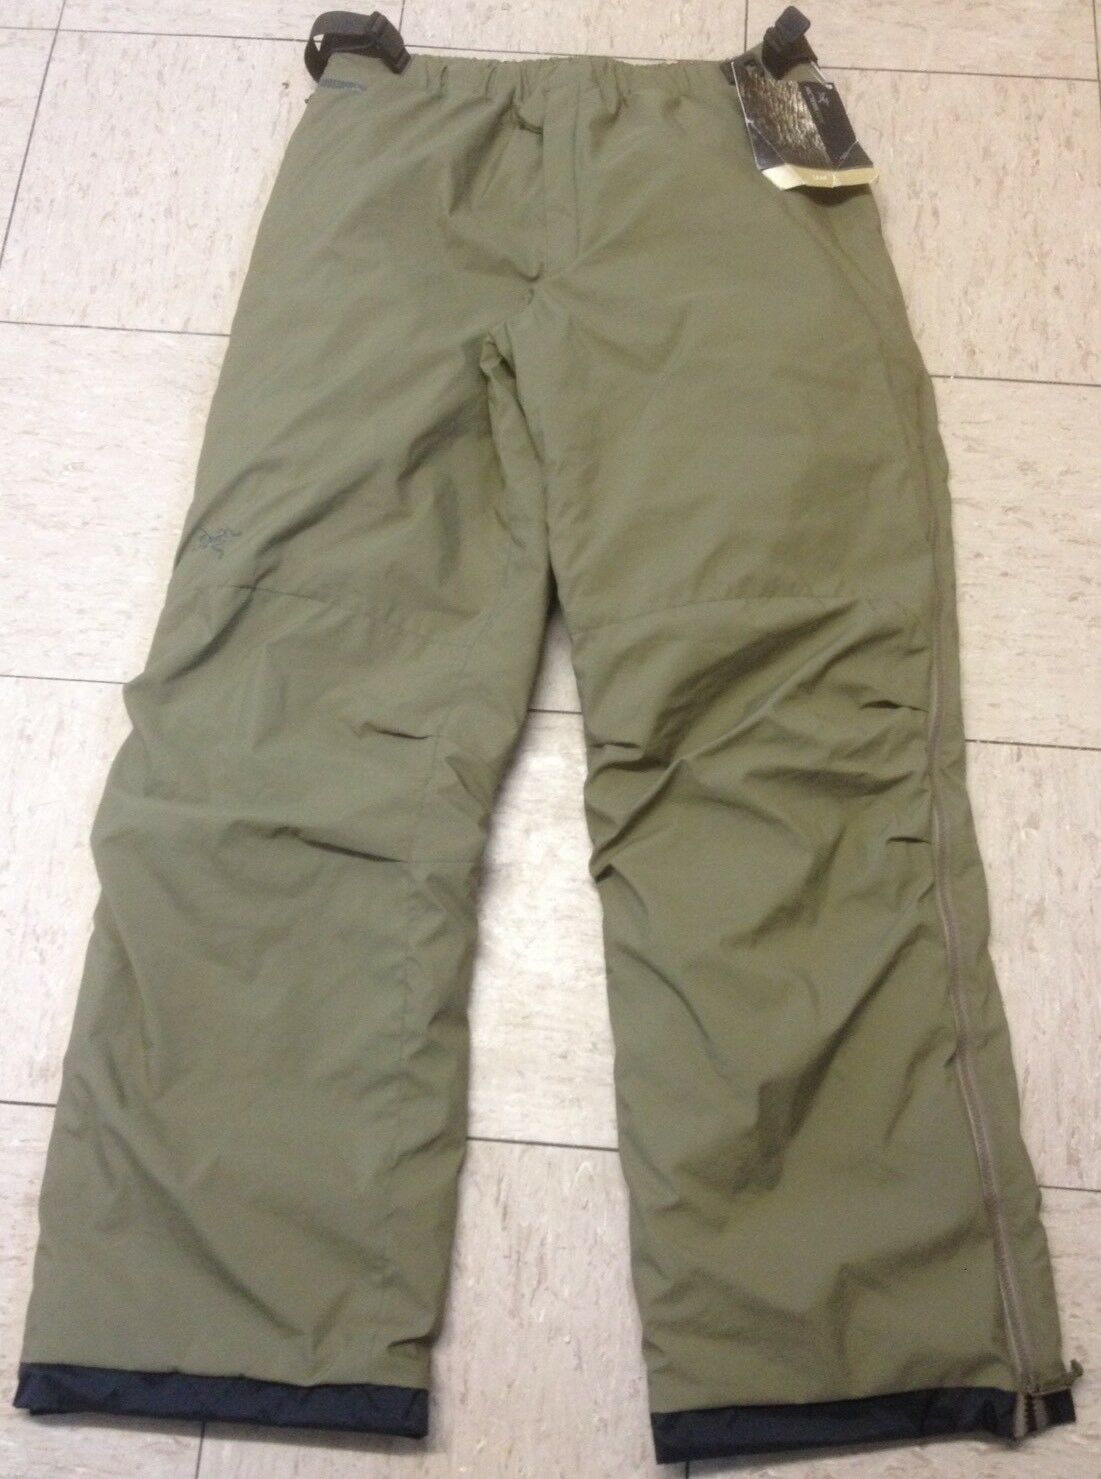 Arc'teryx LEAF  Men's Fusion Pants Large Regular - 8756 UKSF SAS SBS SEALS  new sadie